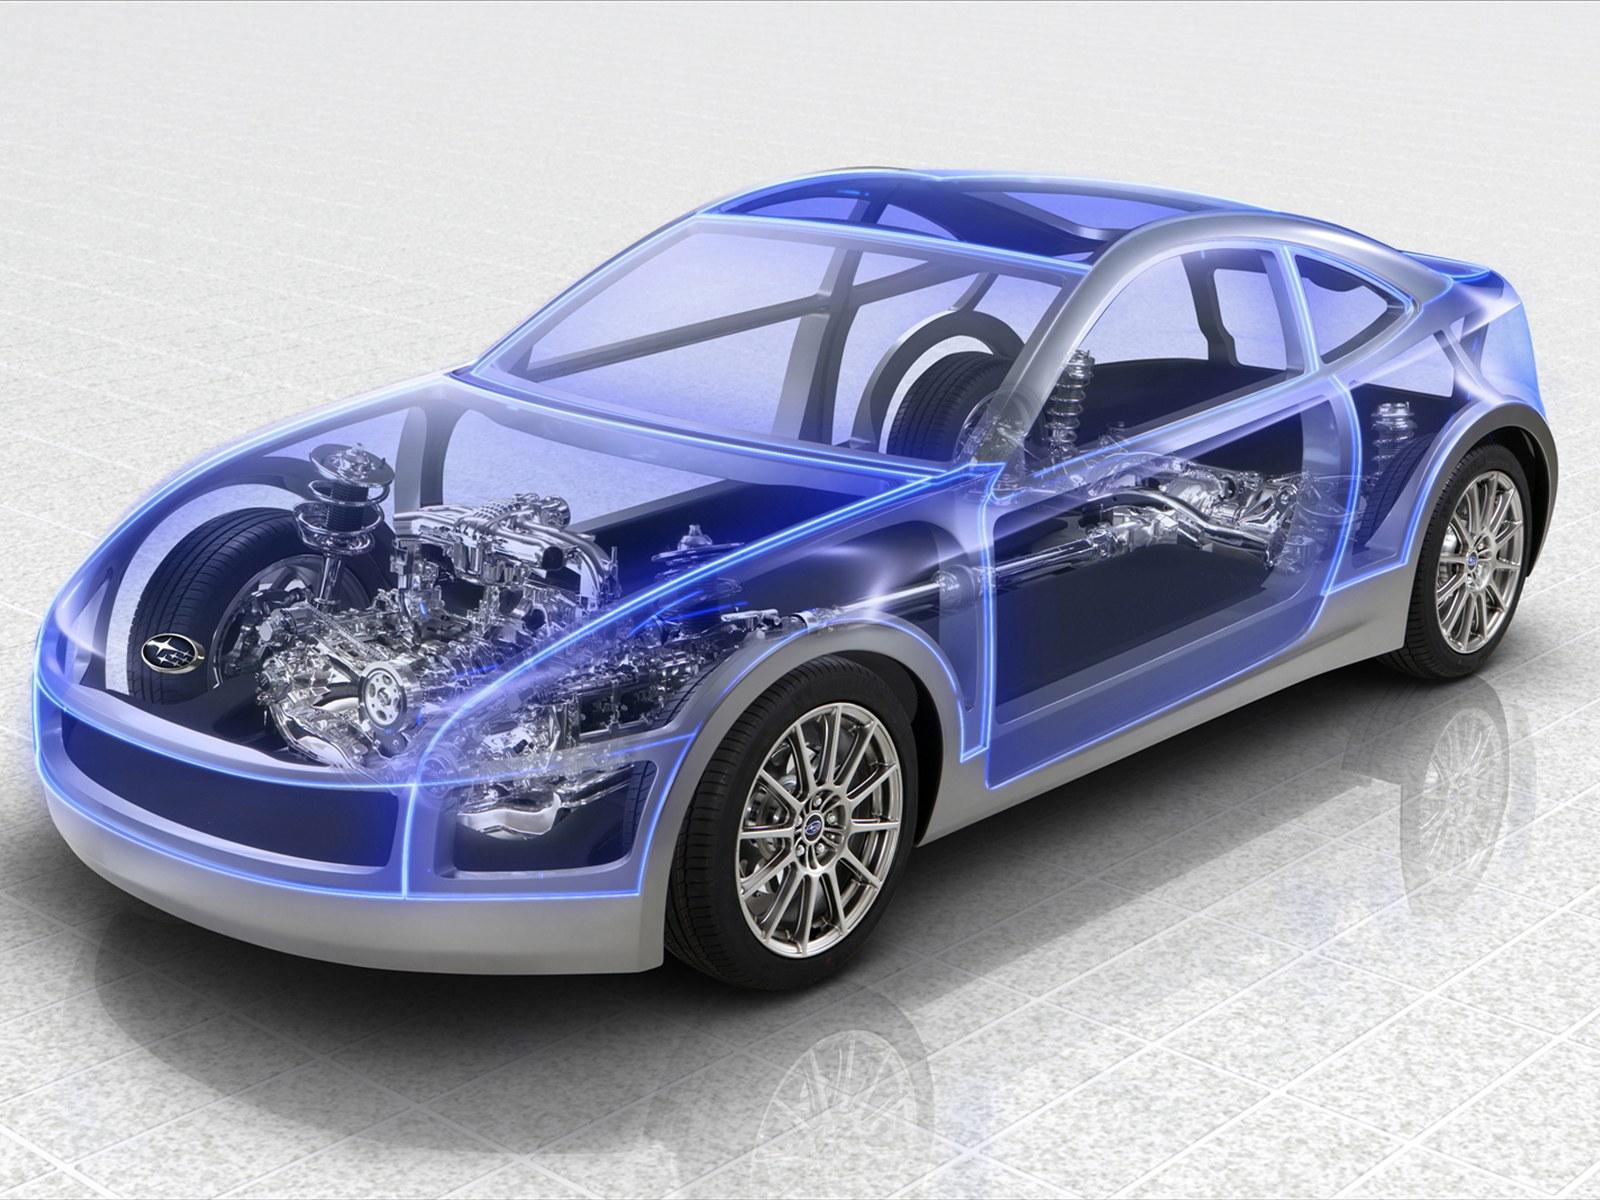 car pictures subaru boxer sports car architecture 2011. Black Bedroom Furniture Sets. Home Design Ideas